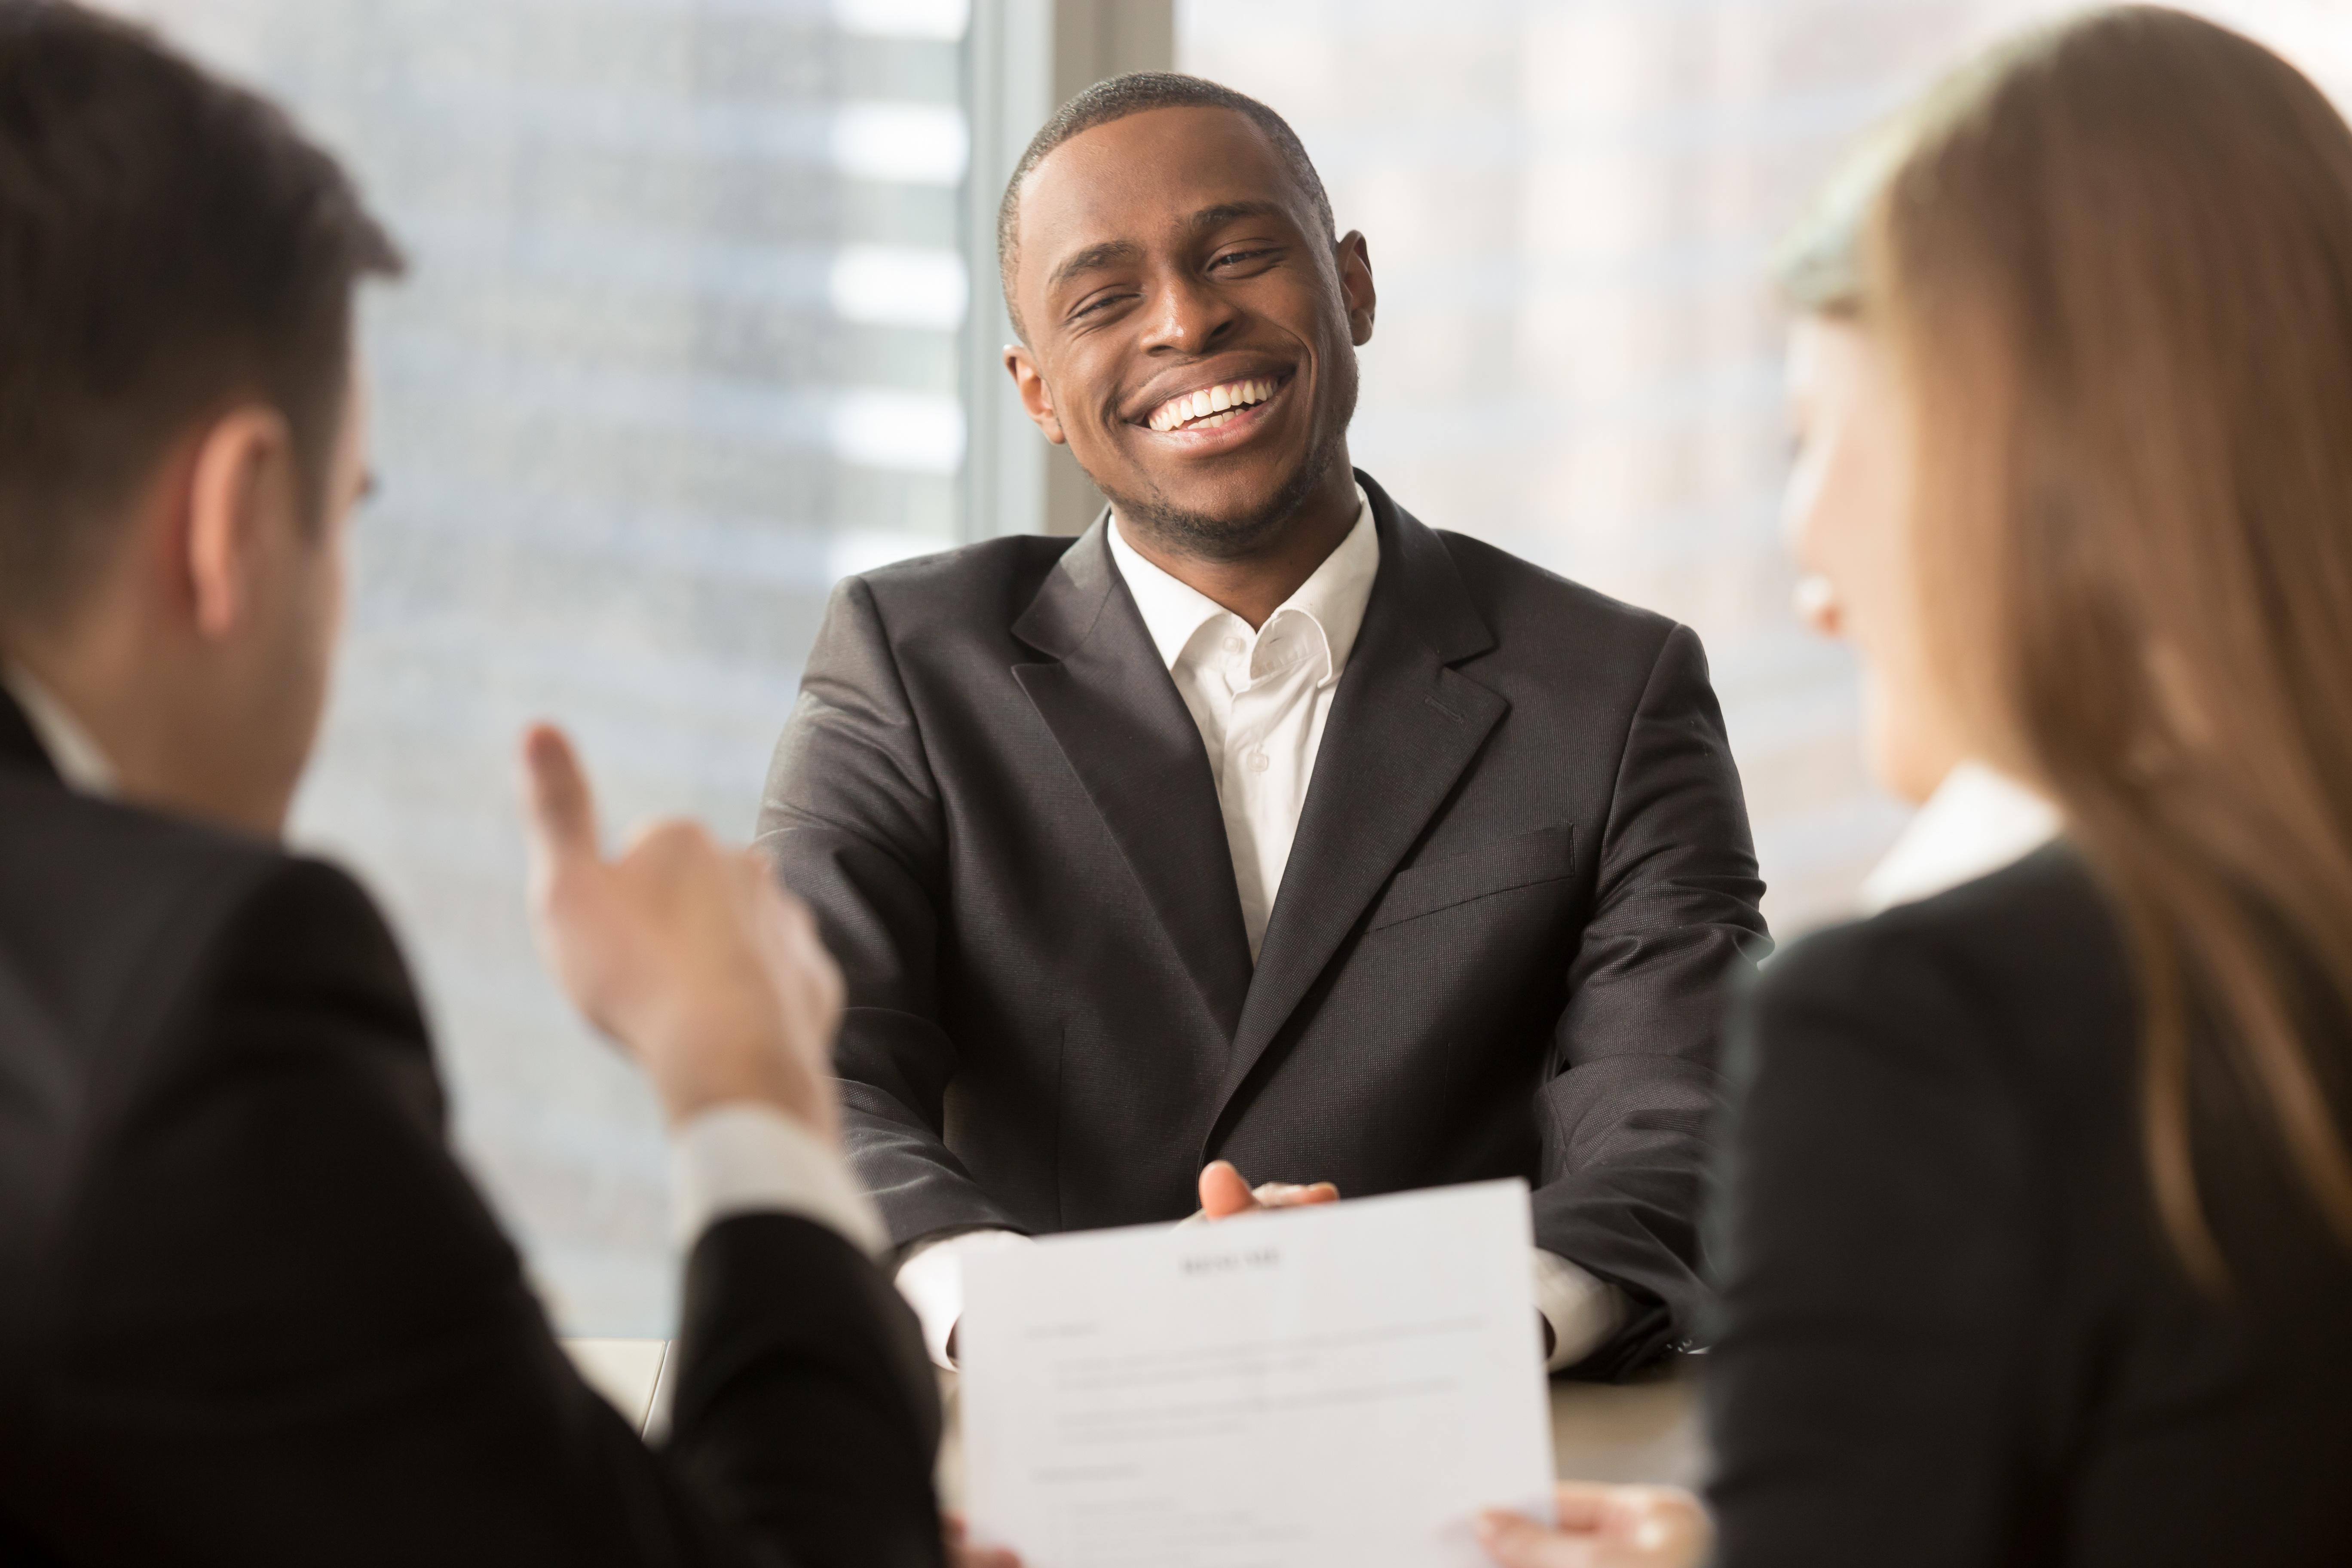 Interview skills1